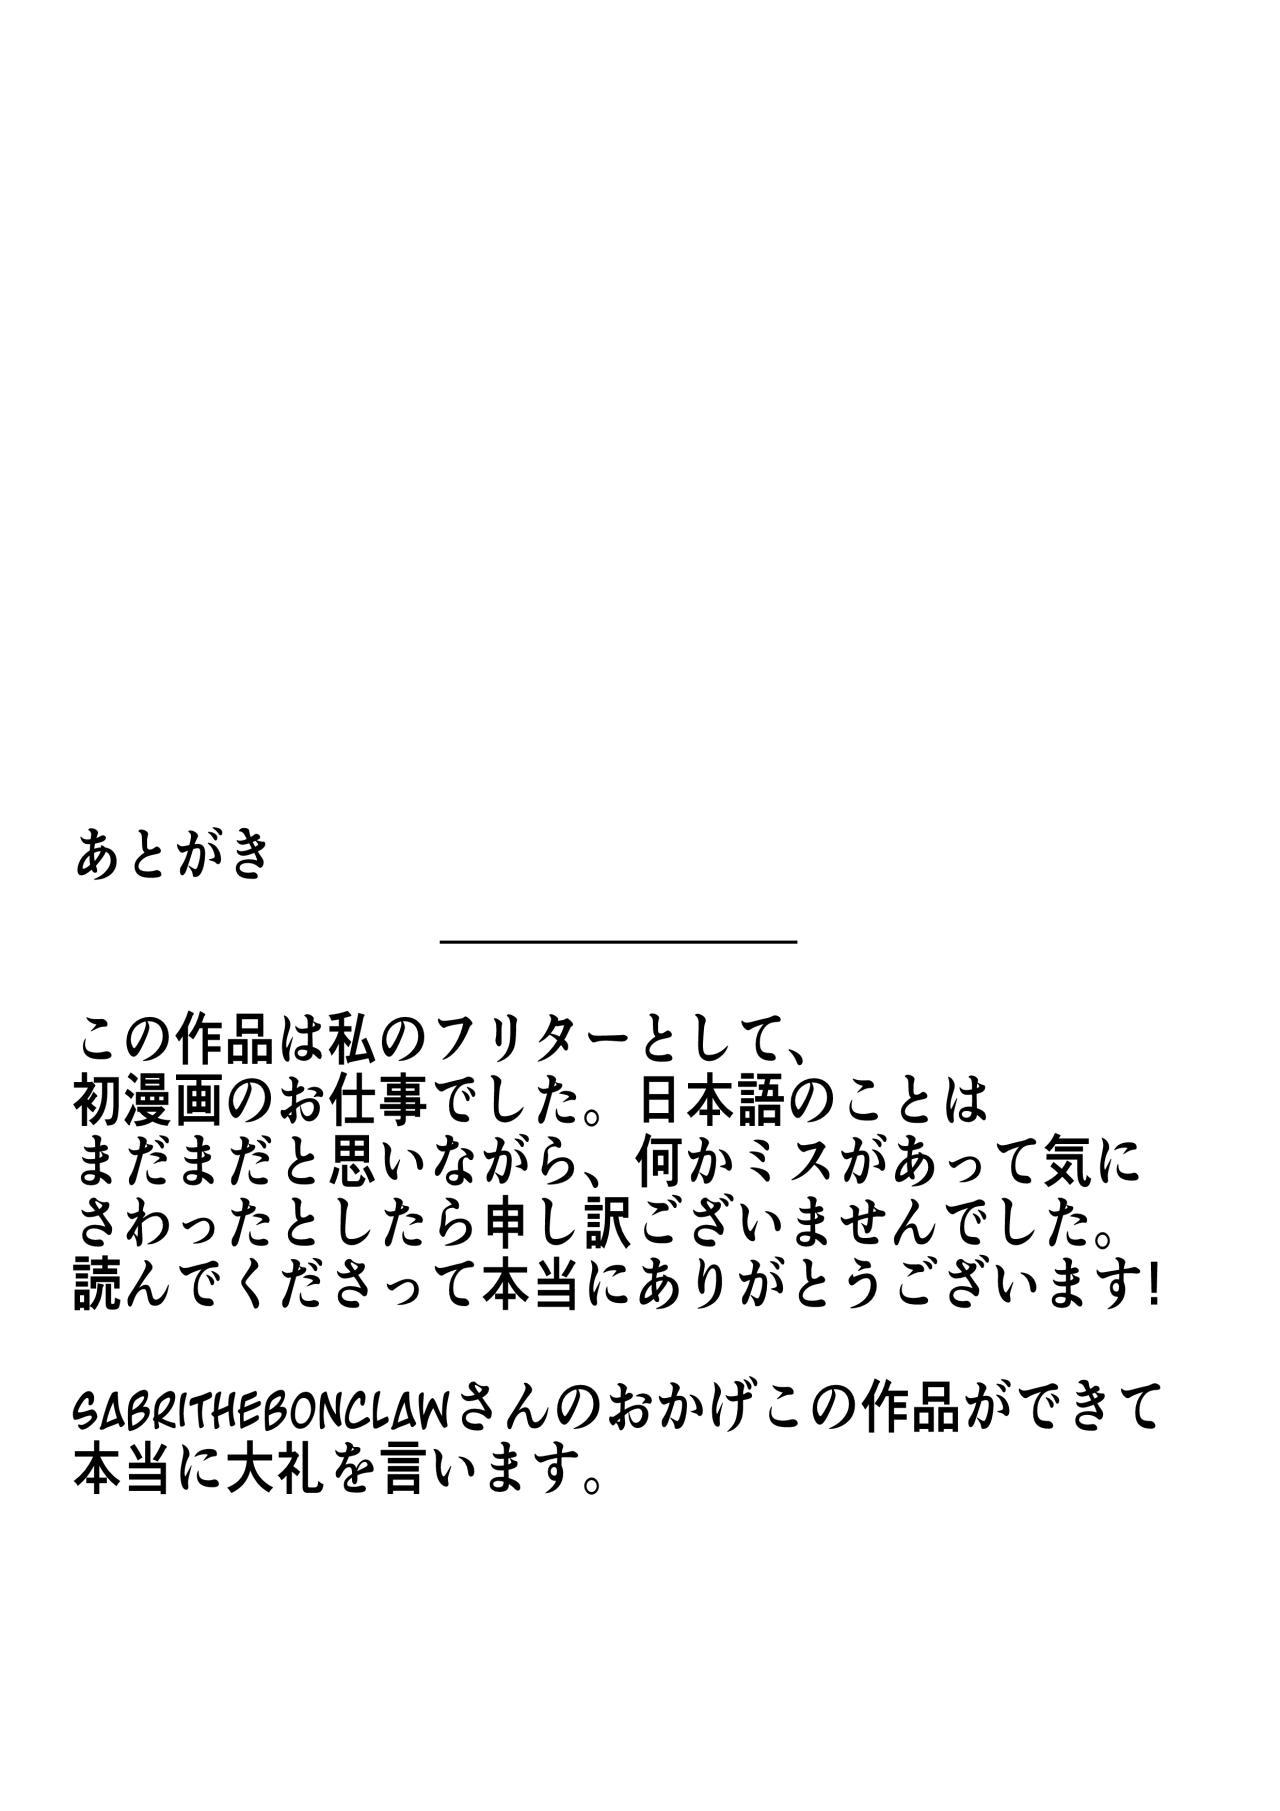 [Tamada Heijun] Ryuu no Otakara (Dragon's Treasure) Ch. 1-2 [Chinese][垃圾机翻] 30